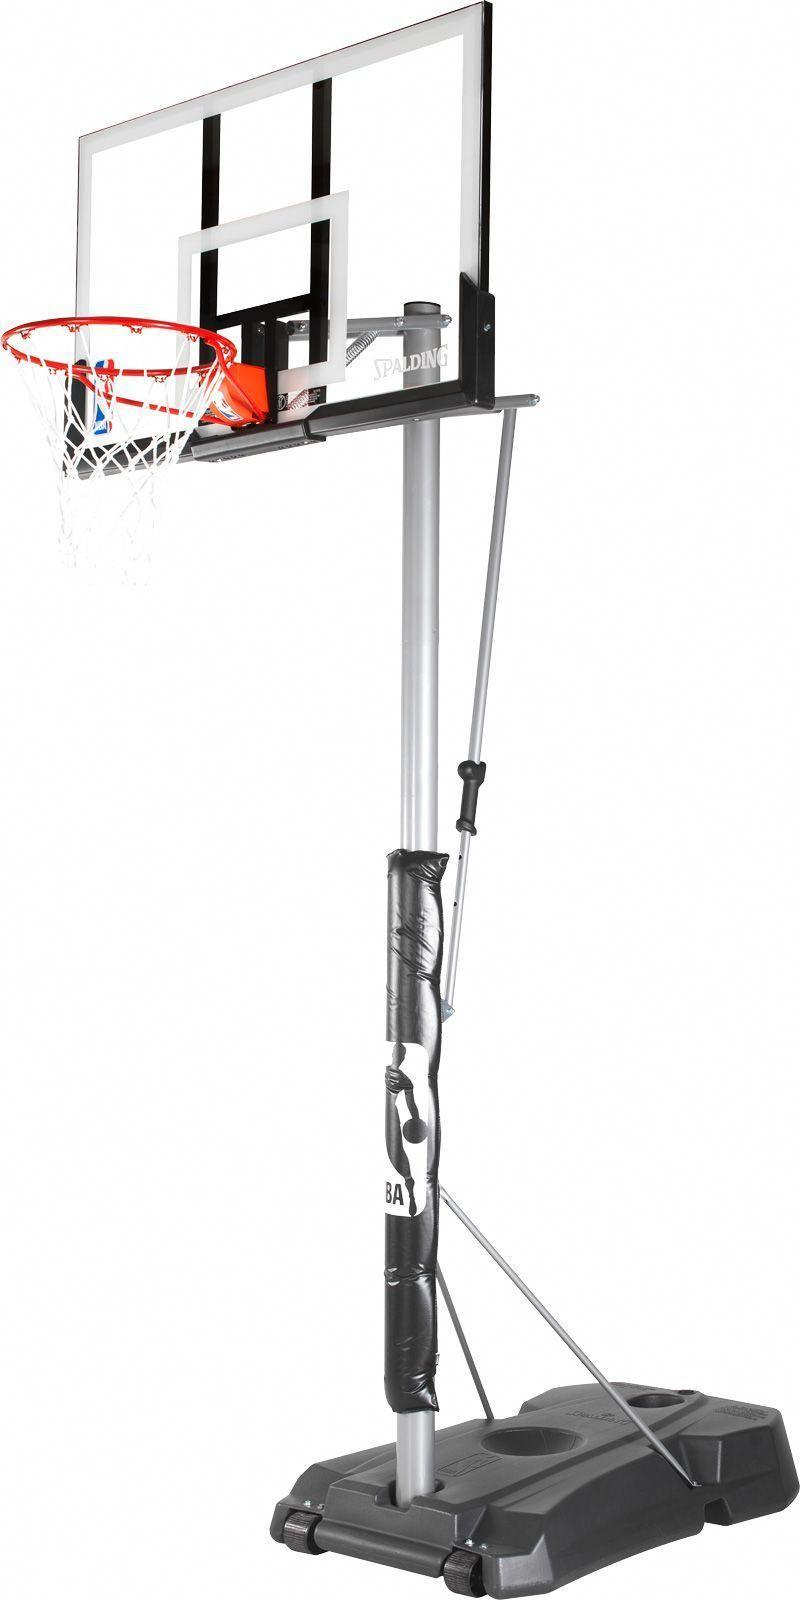 Basketball Near Me Youth Basketballfortonight Spaldingbasketballhoop With Images Portable Basketball Hoop Basketball Hoop Spalding Basketball Hoop